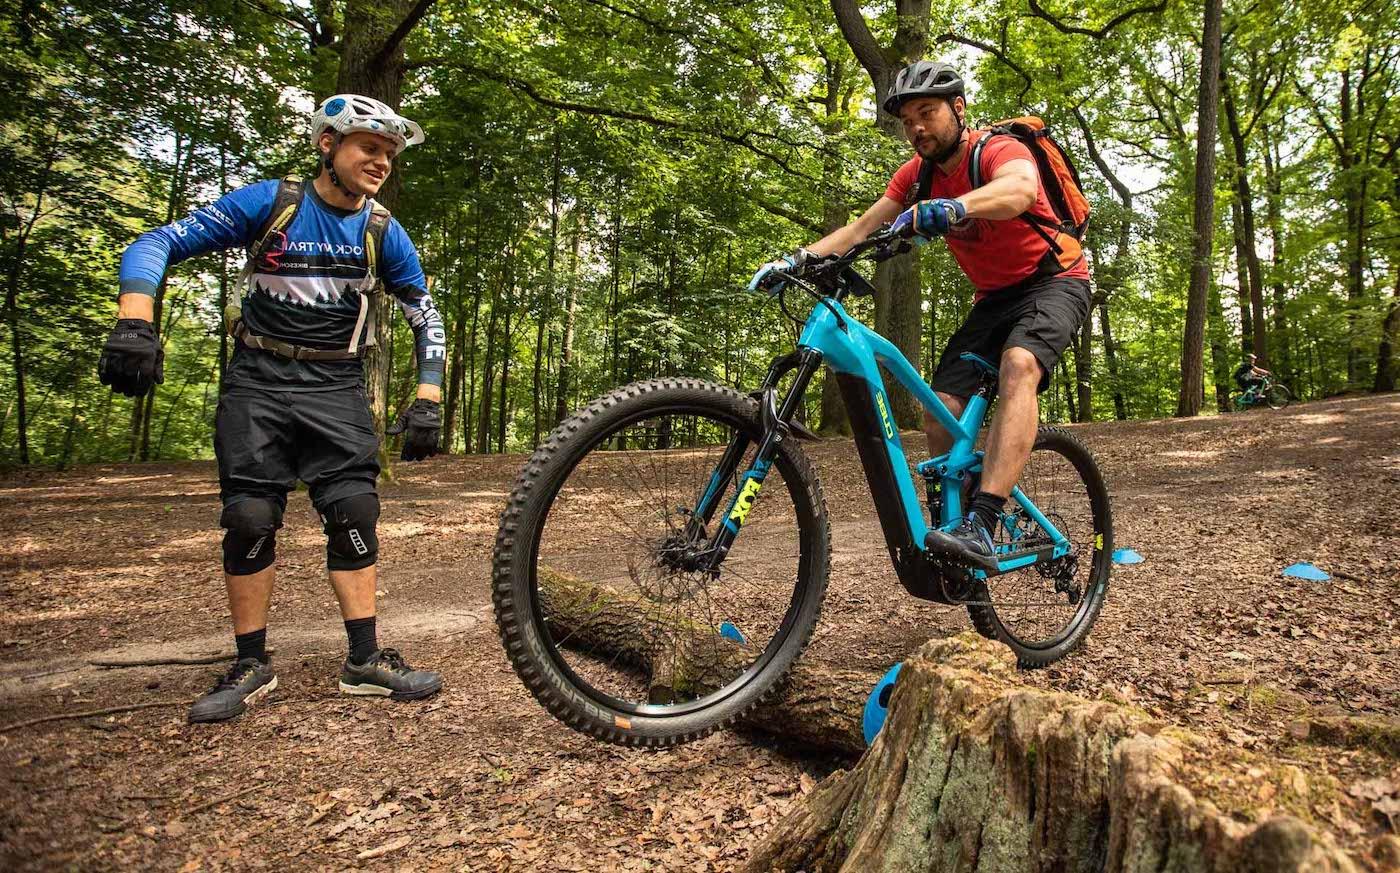 eBike MTB Fahrtechnik Kurse Ruhrgebiet Wetter Witten Trails Sicherheit Spaß Anfänger Fortgeschritten Experten Kinder Rock my Trail Bikeschule -1